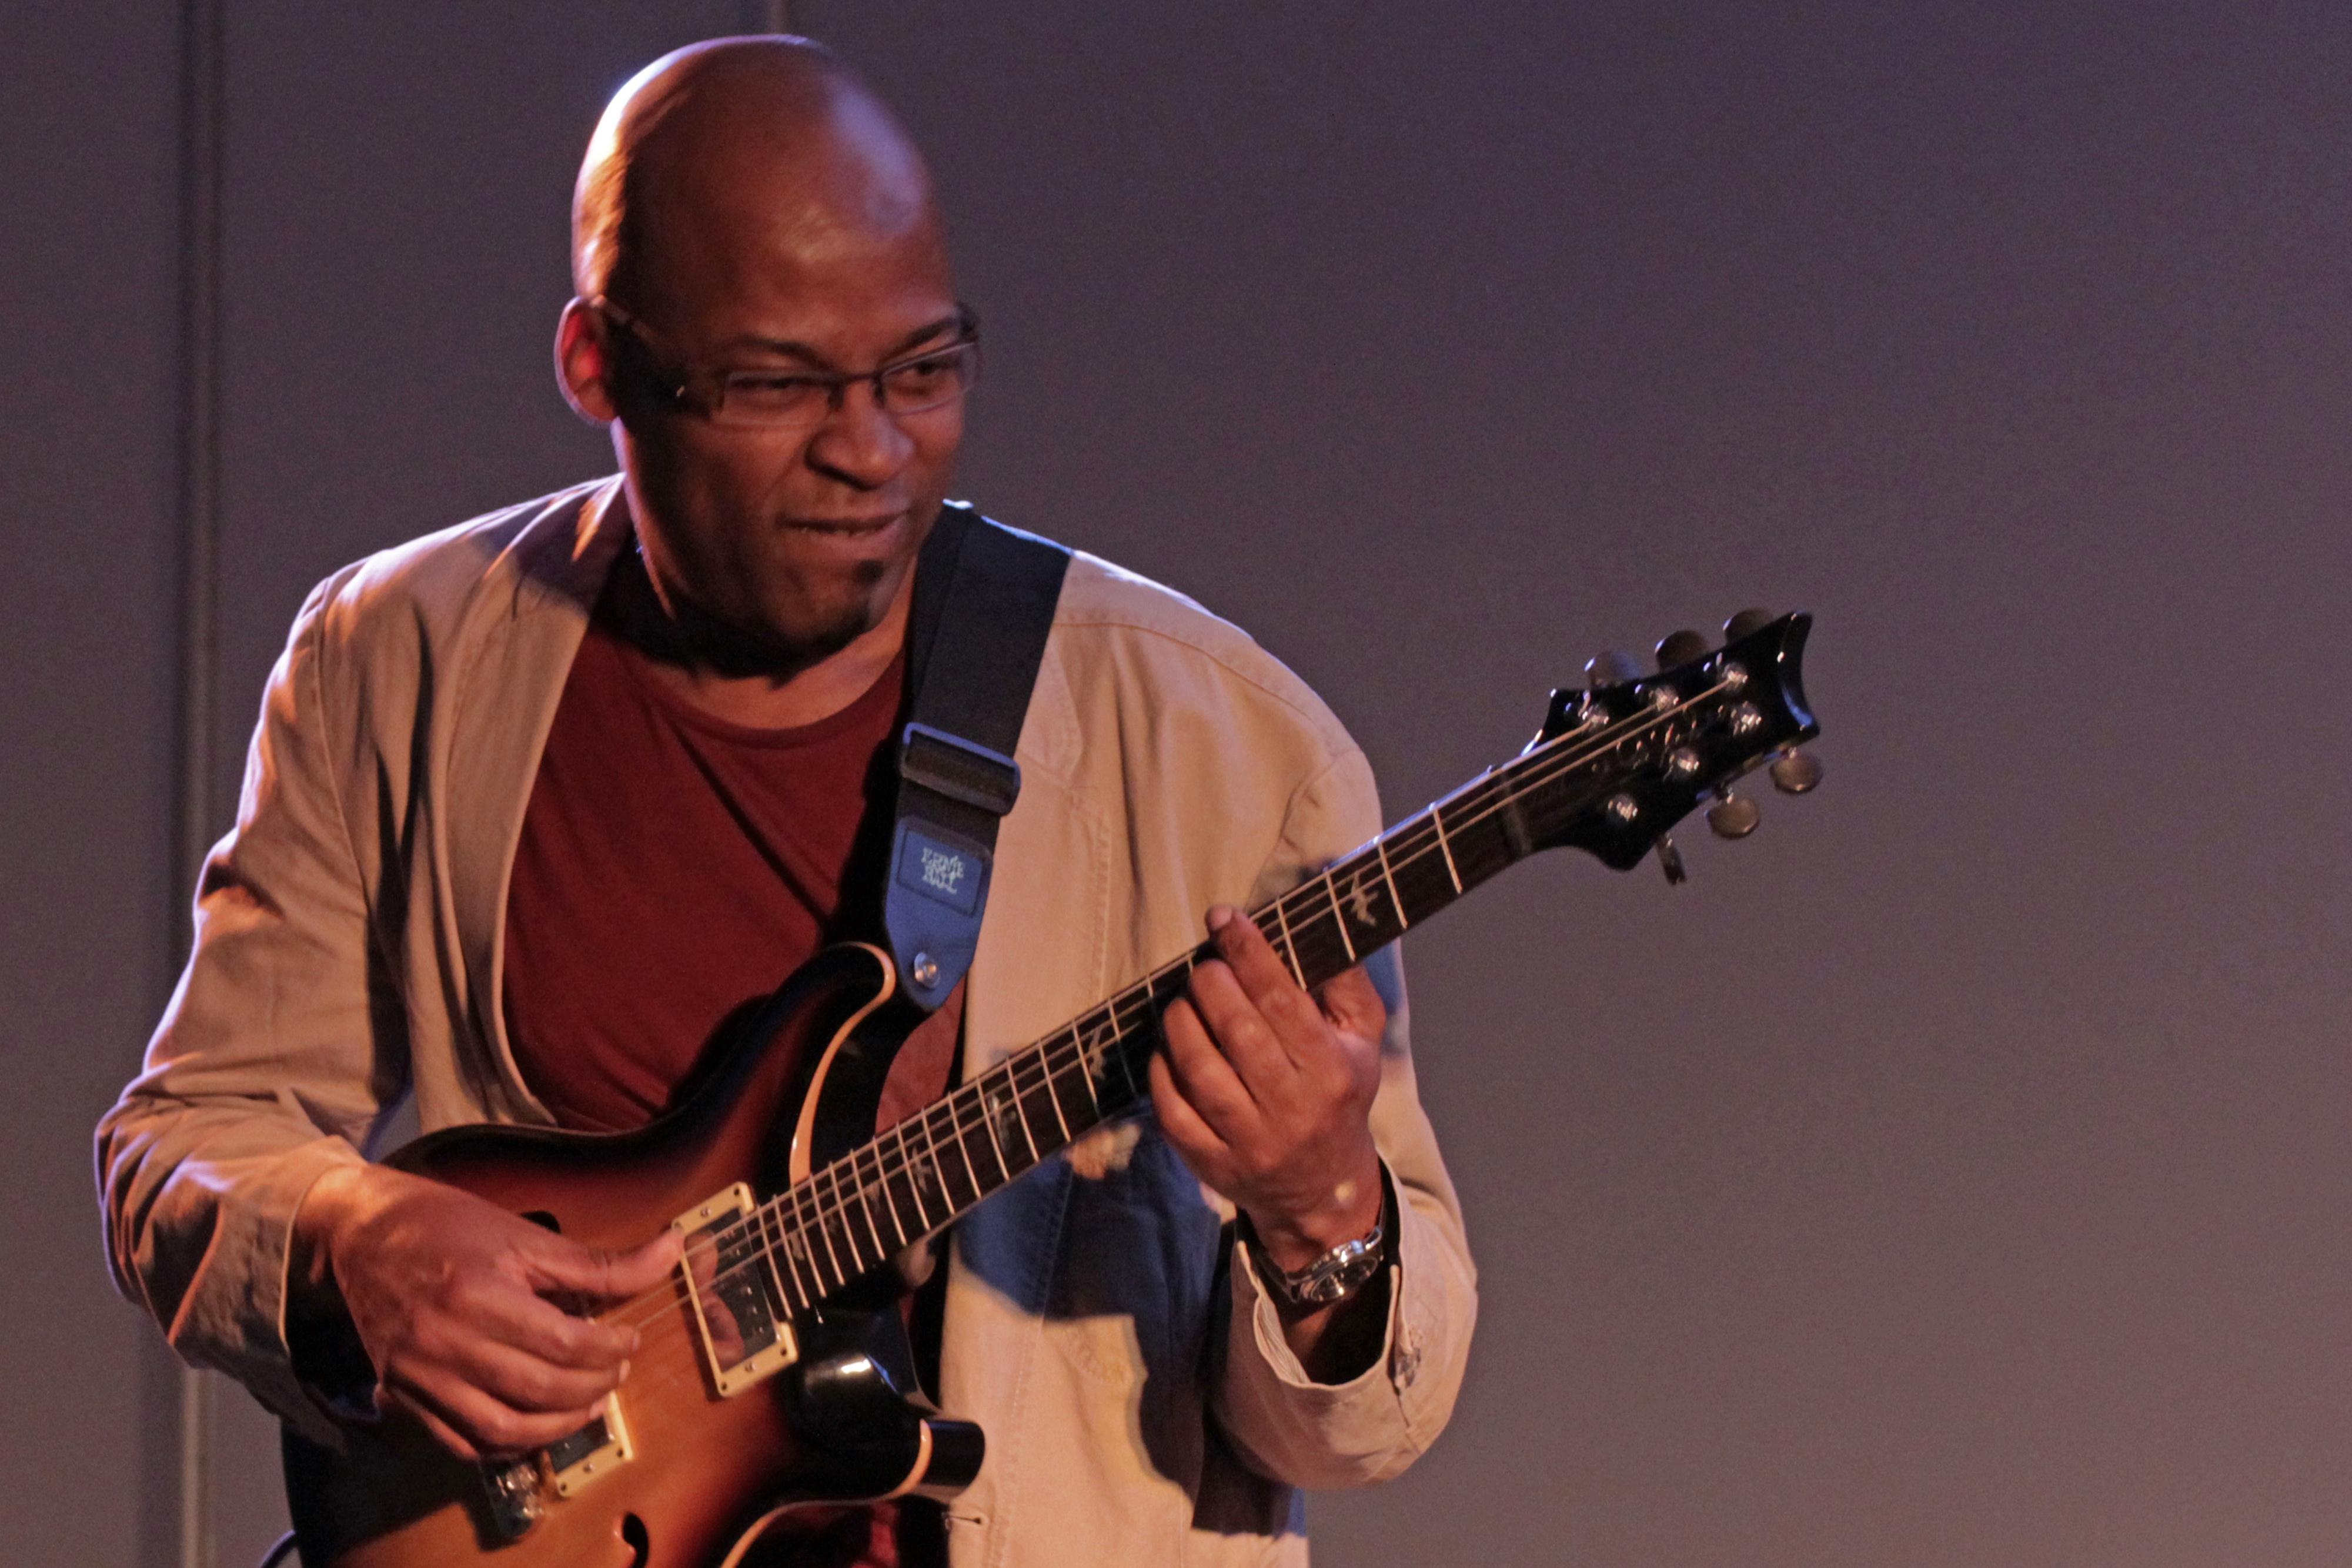 Lionel loueke at tri-c jazzfest cleveland 2013